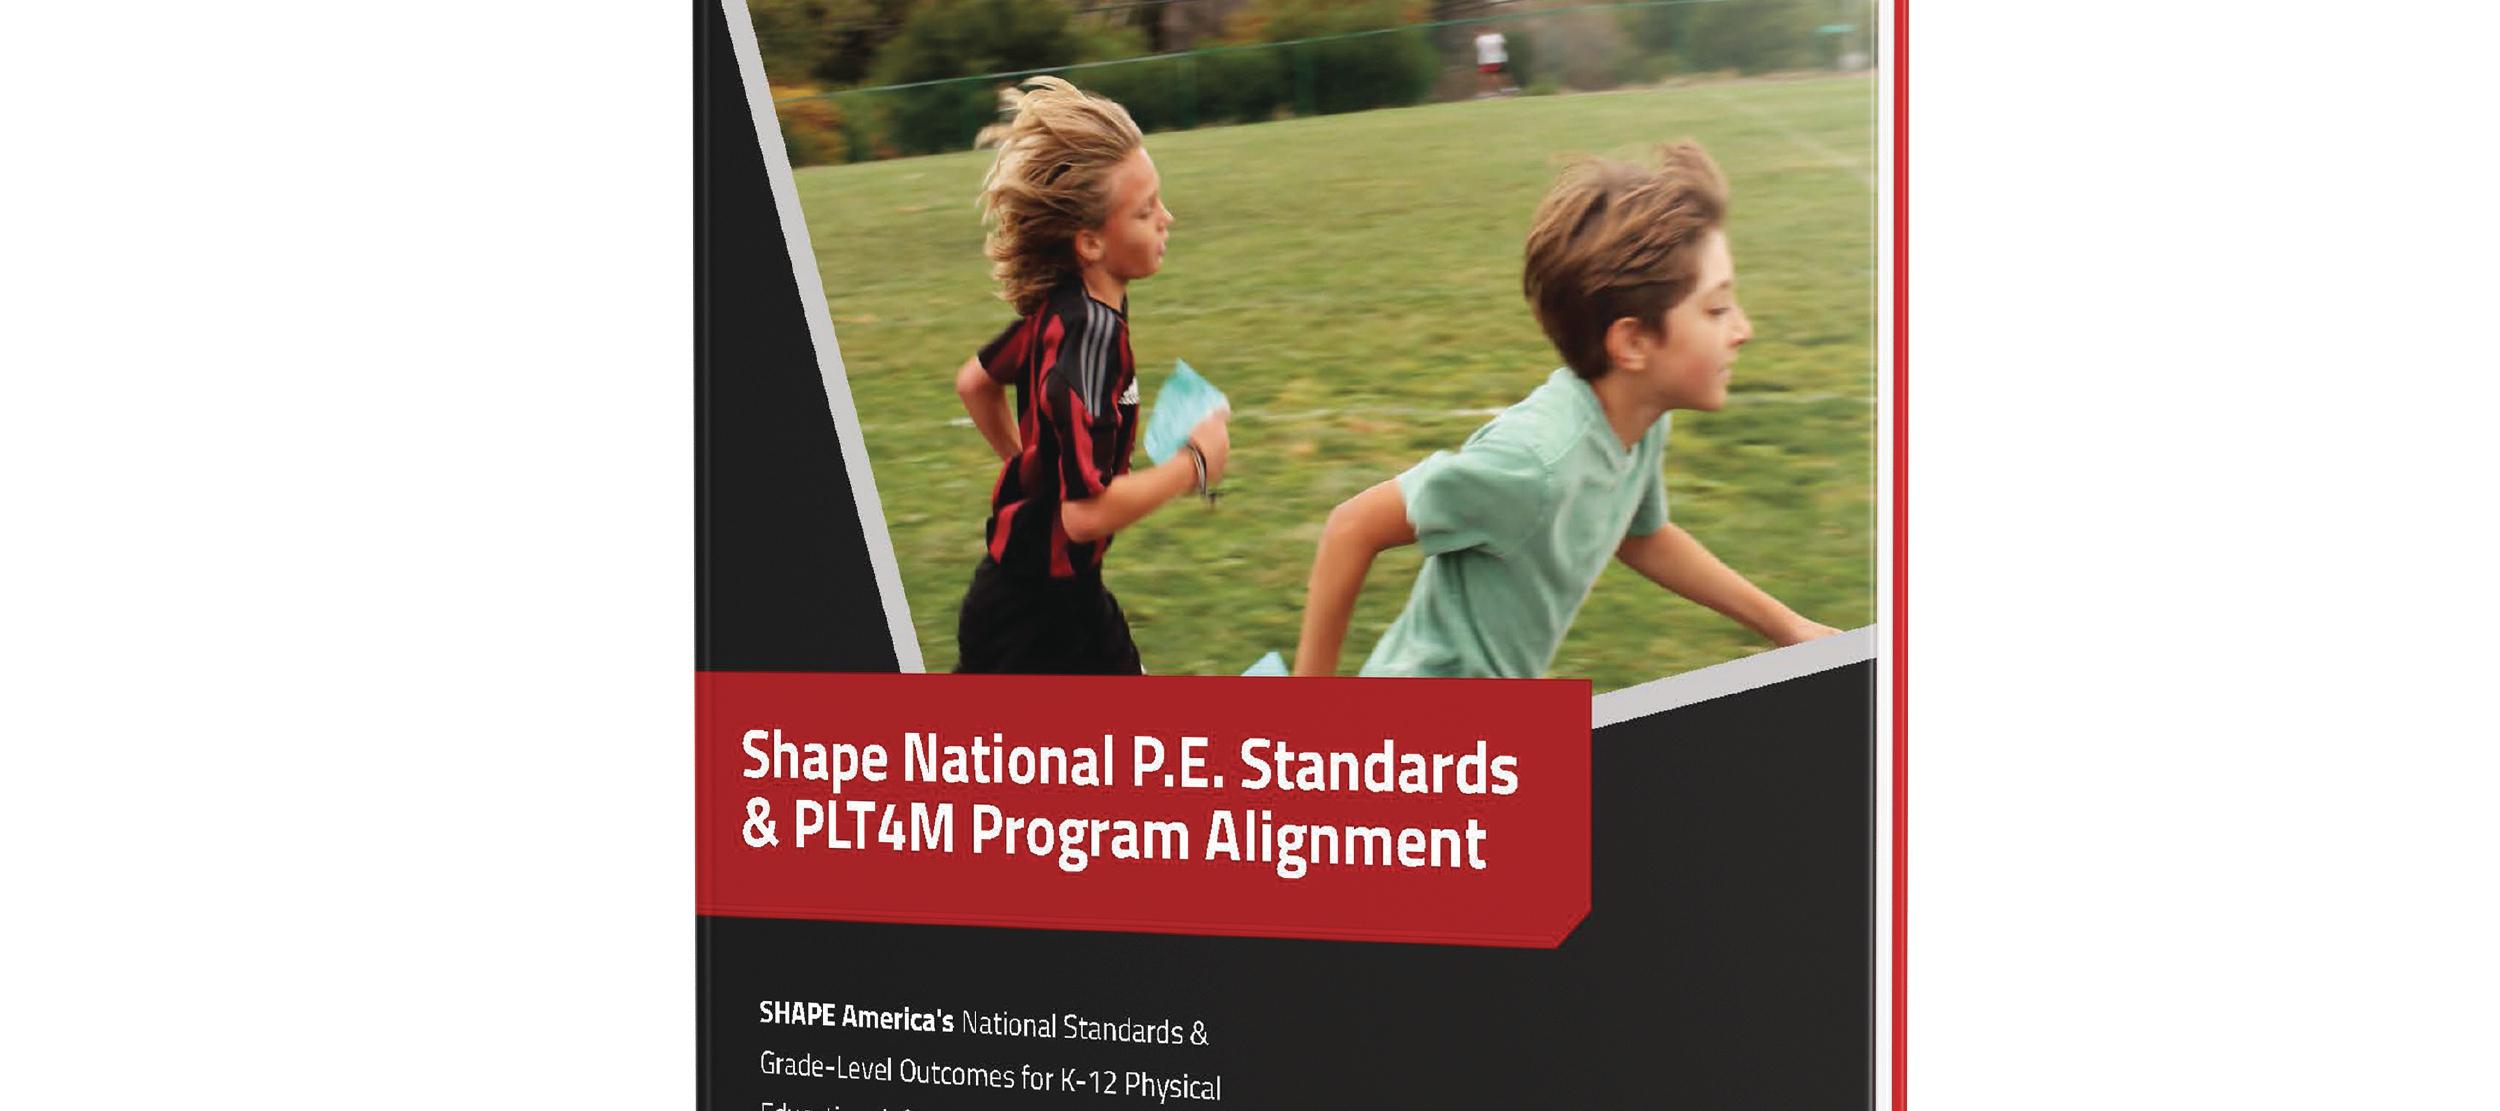 SHAPE National P.E. Standards & PLT4M Program Alignment